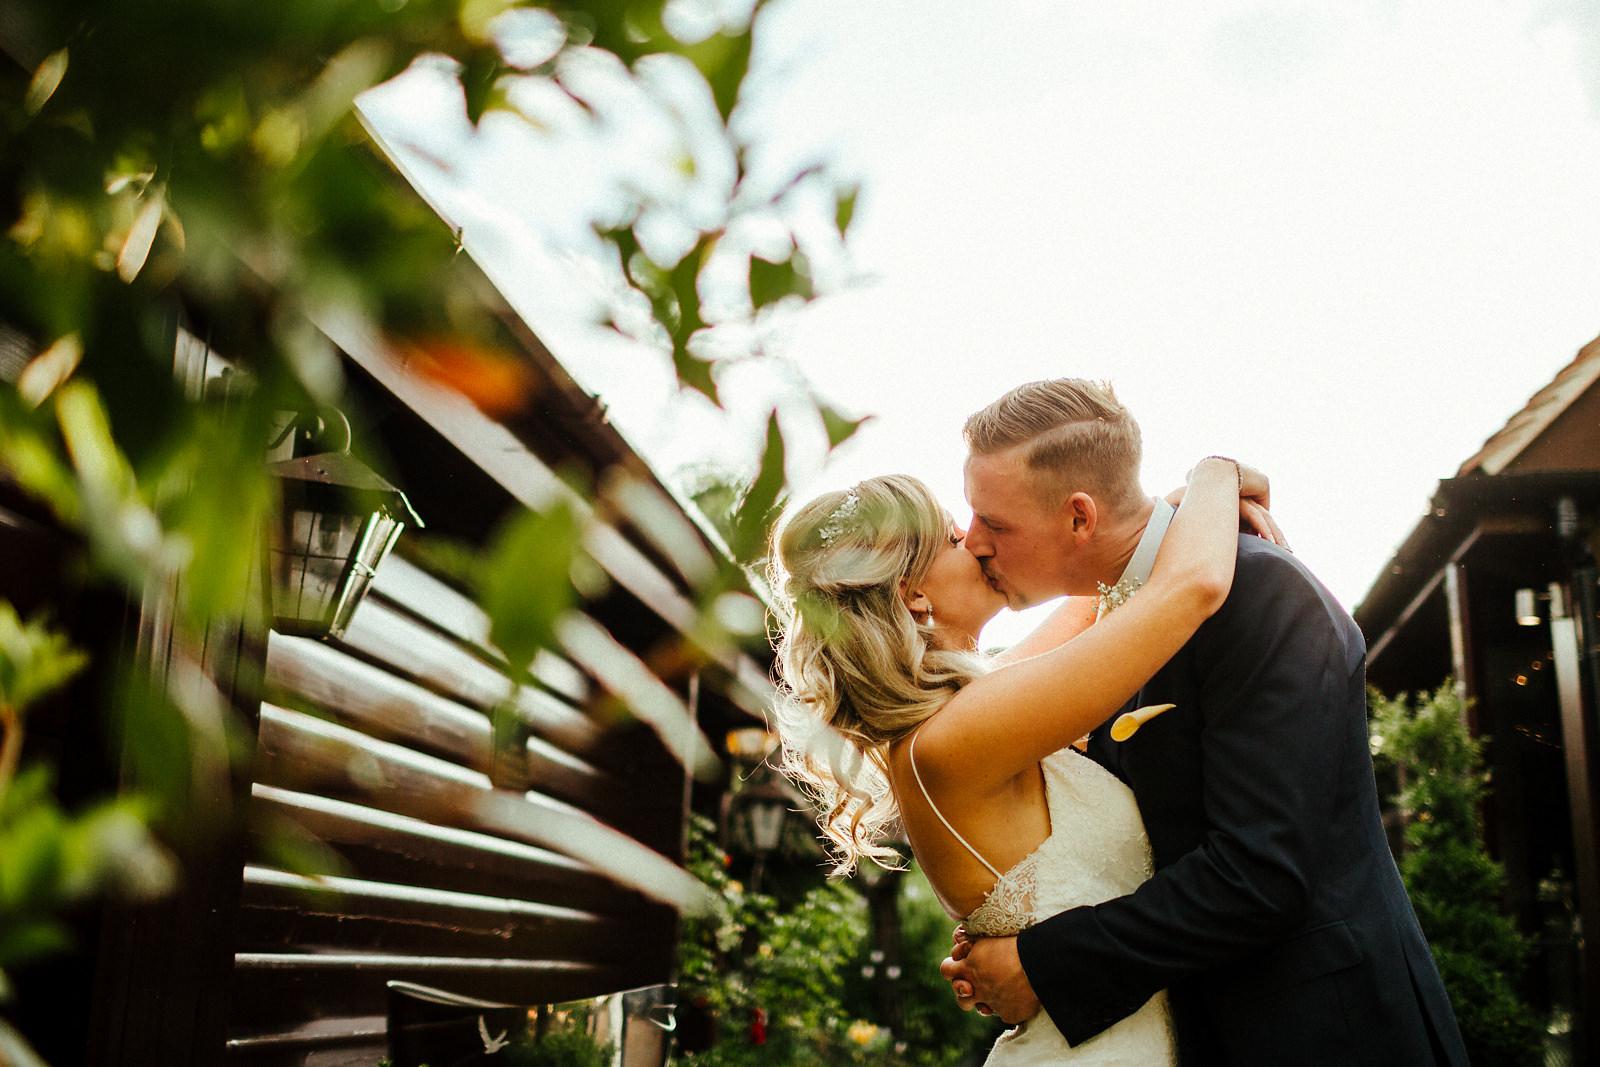 Creative wedding photographer in Oxfordshire